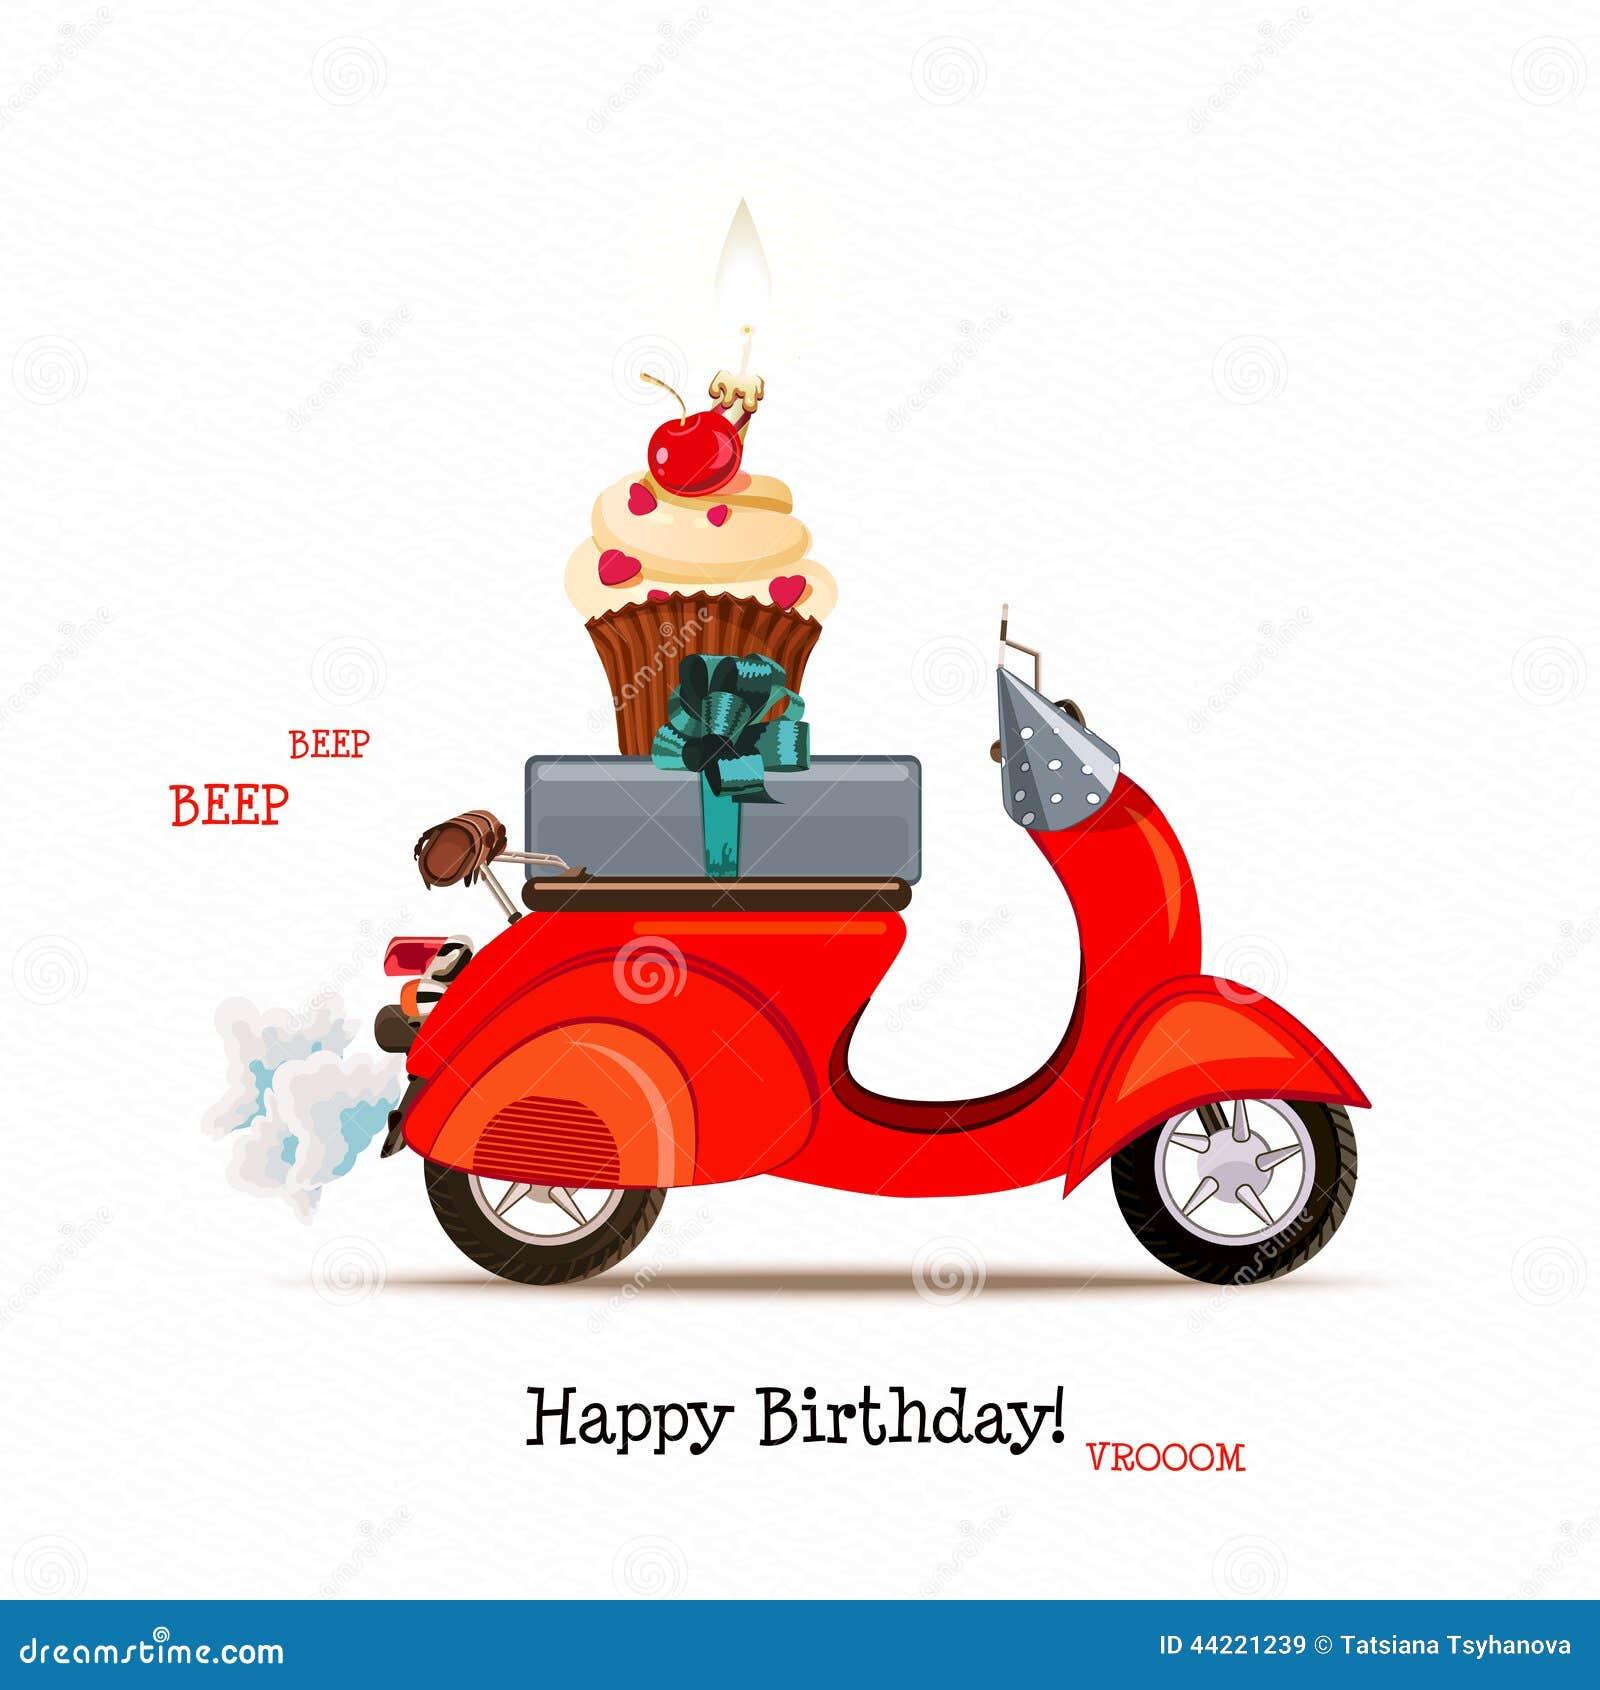 Vintage Motorcycle Birthday Cake